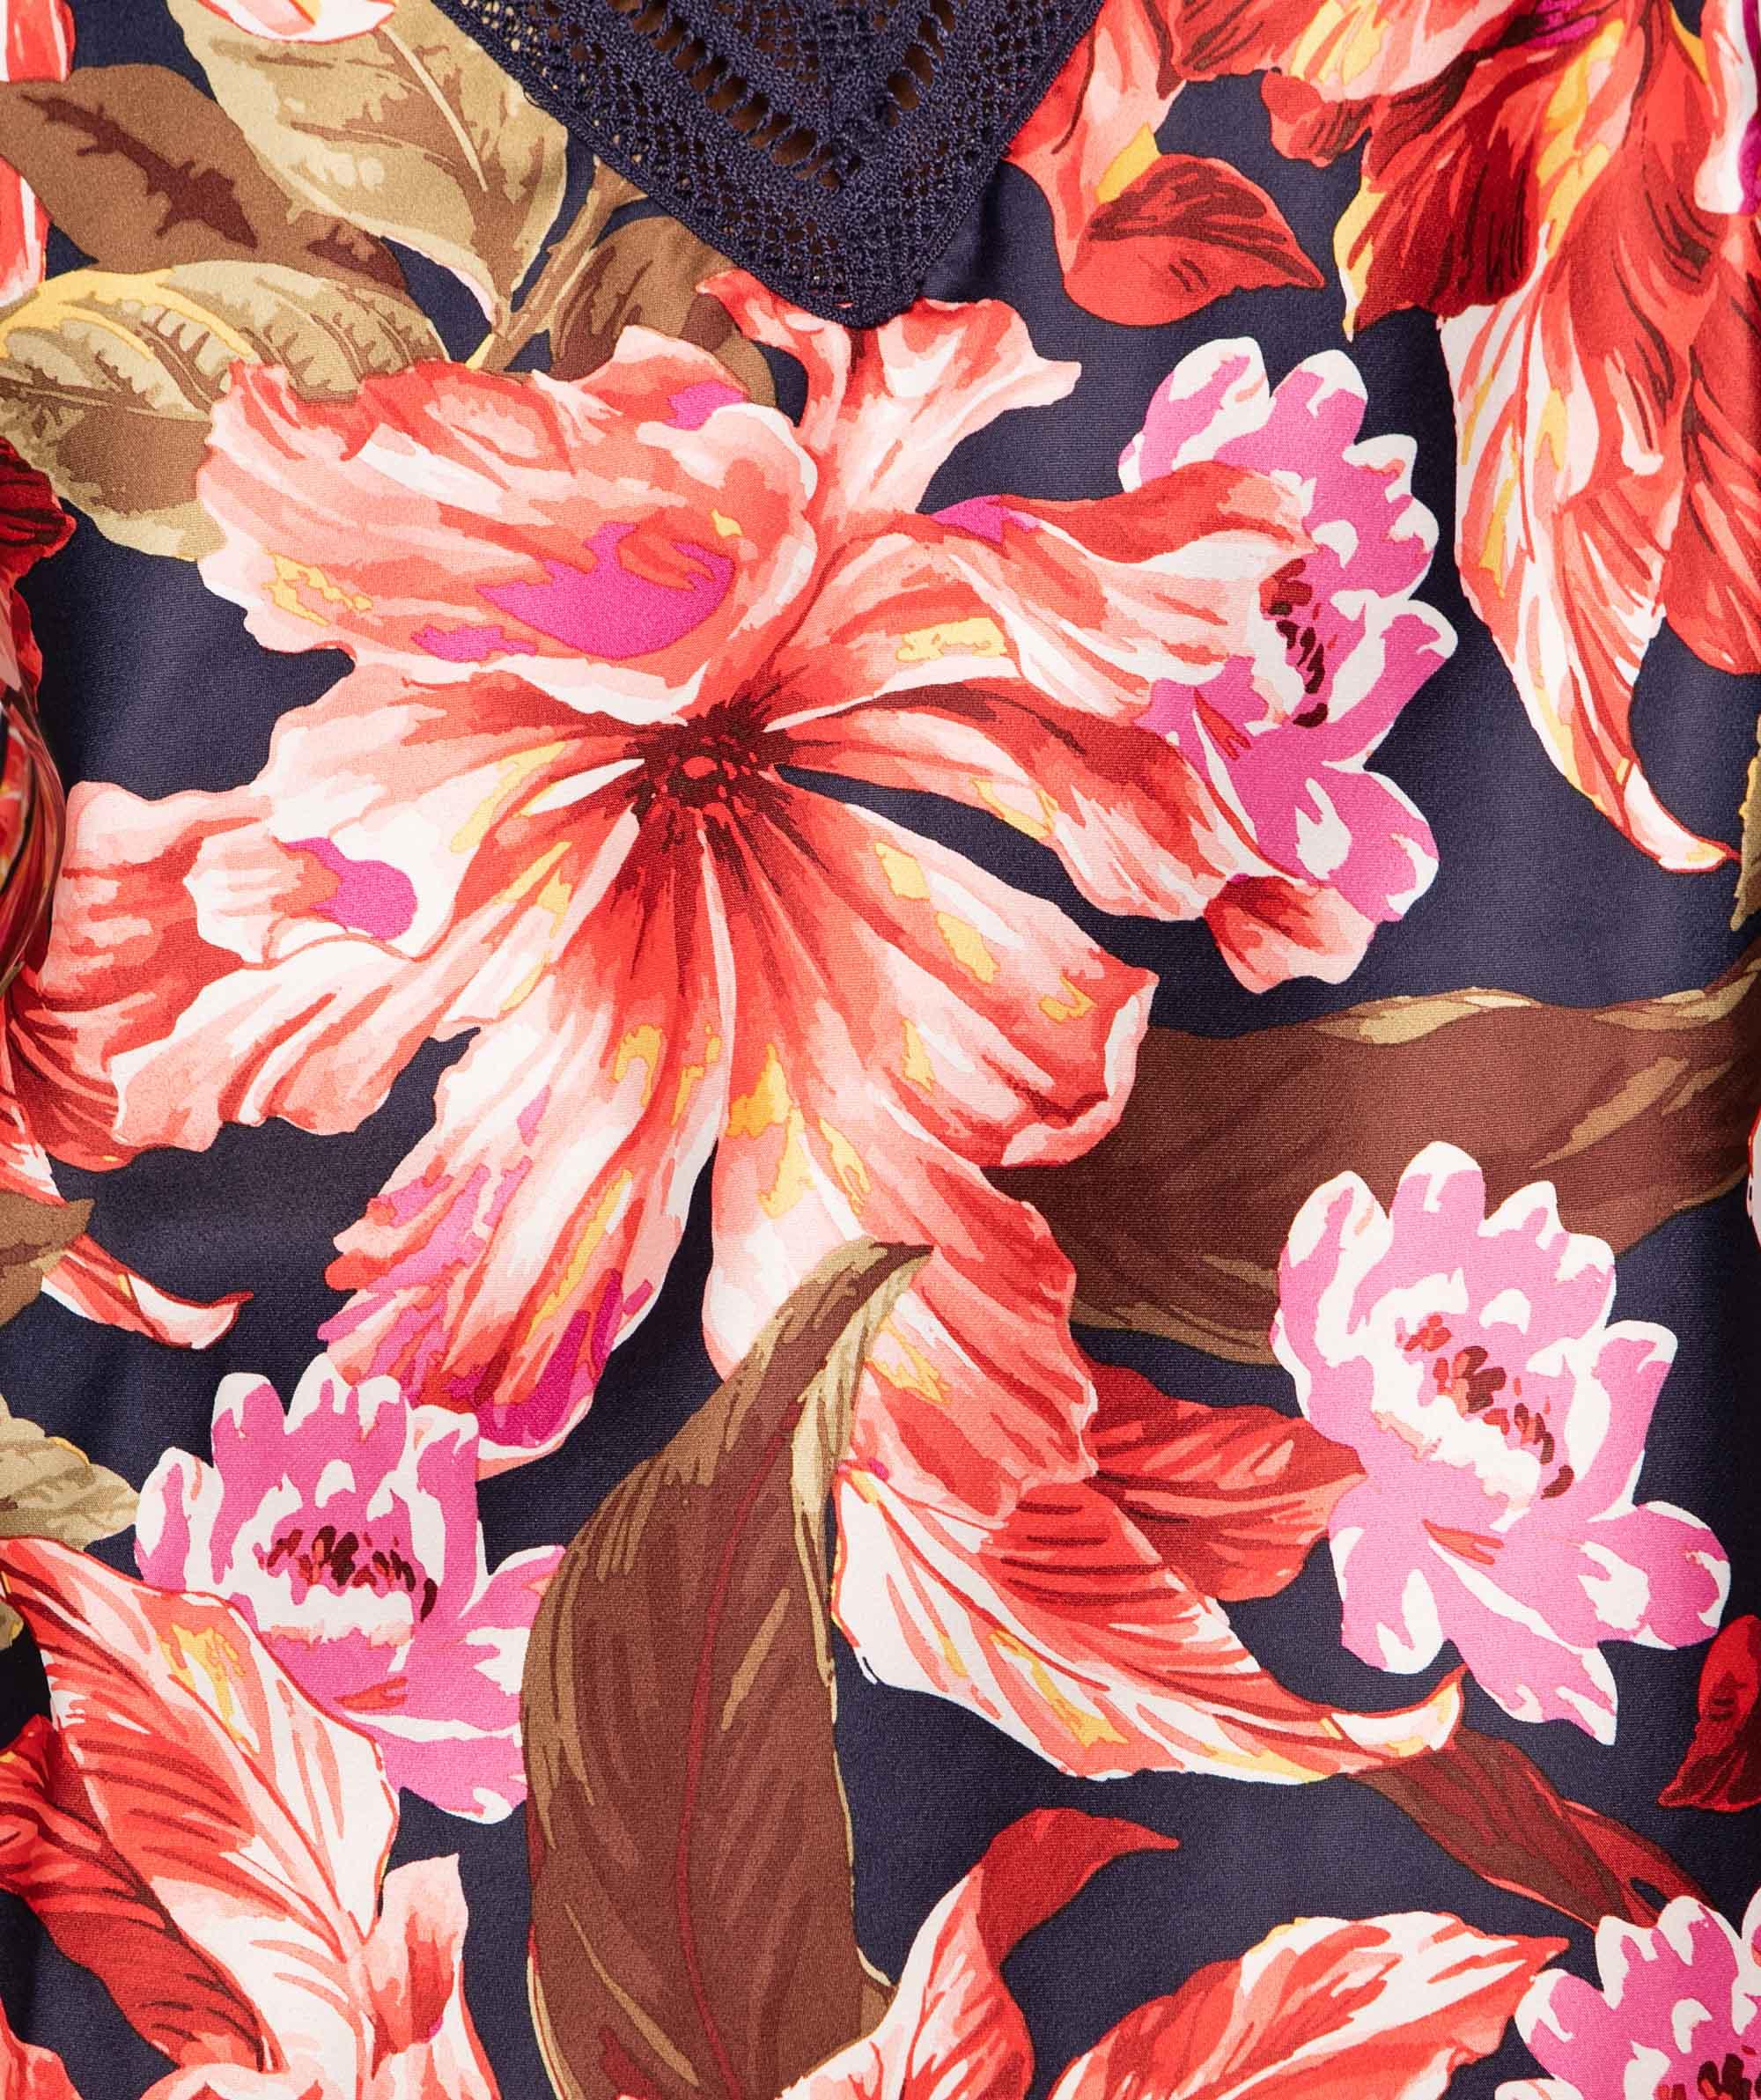 Rustic Fashion Shorts - Floral Print